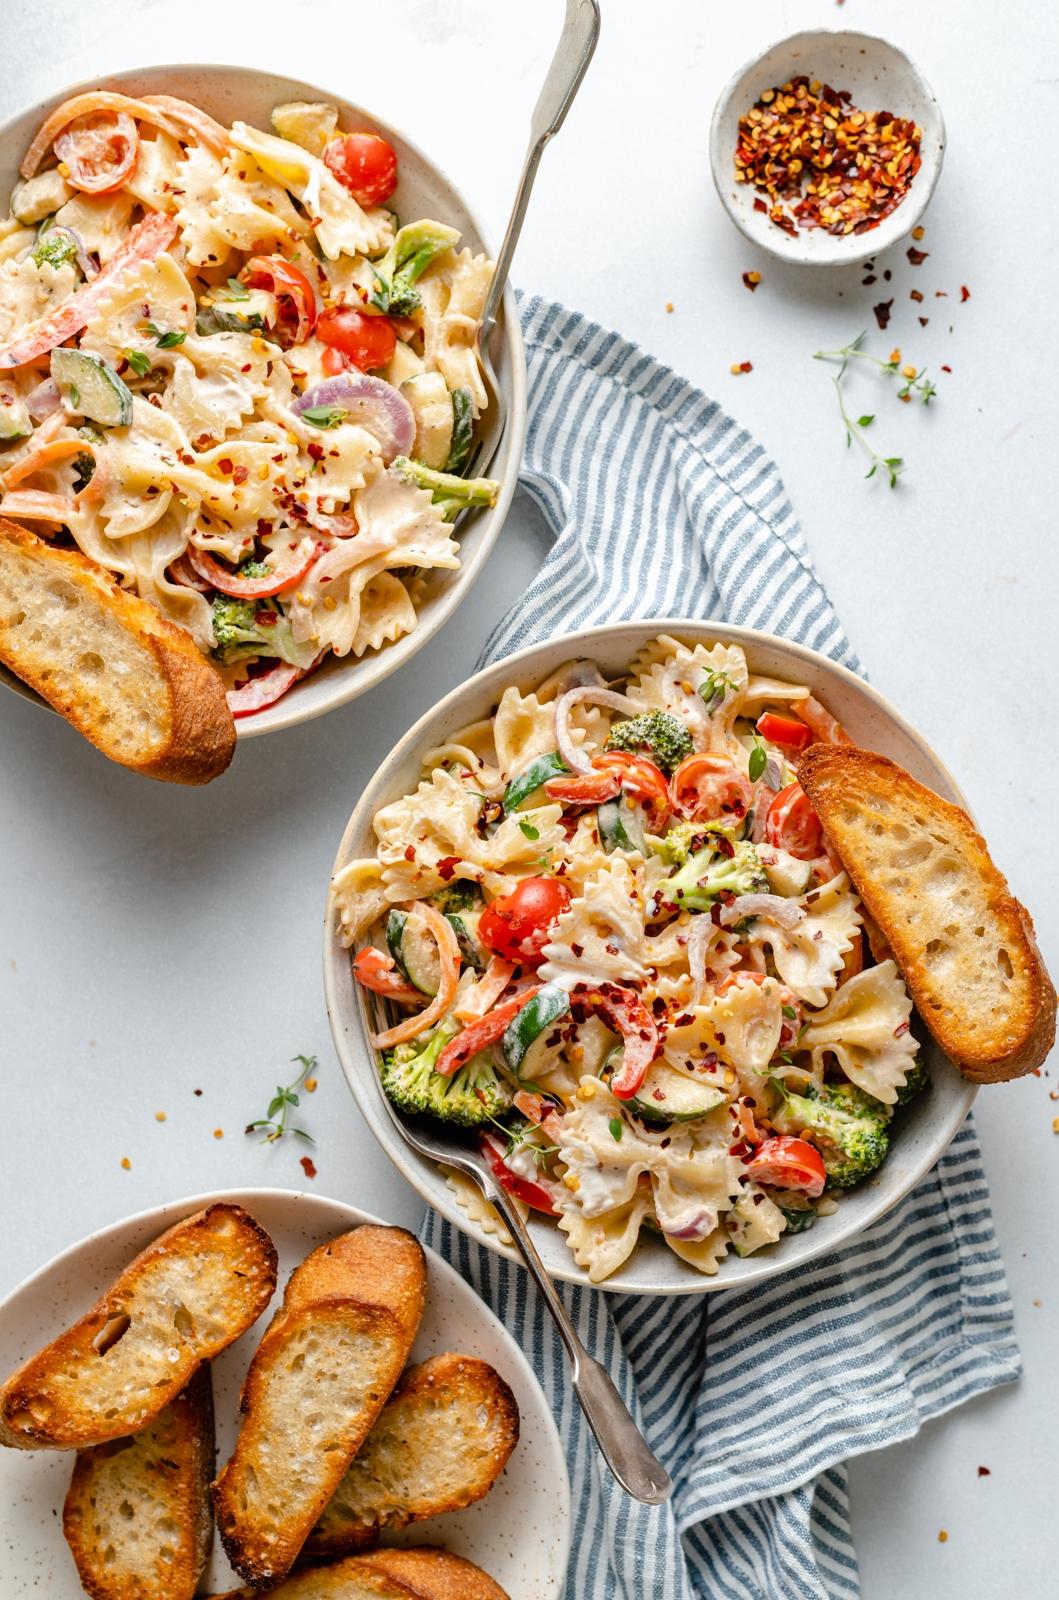 the best vegan pasta primavera in two bowls with garlic bread